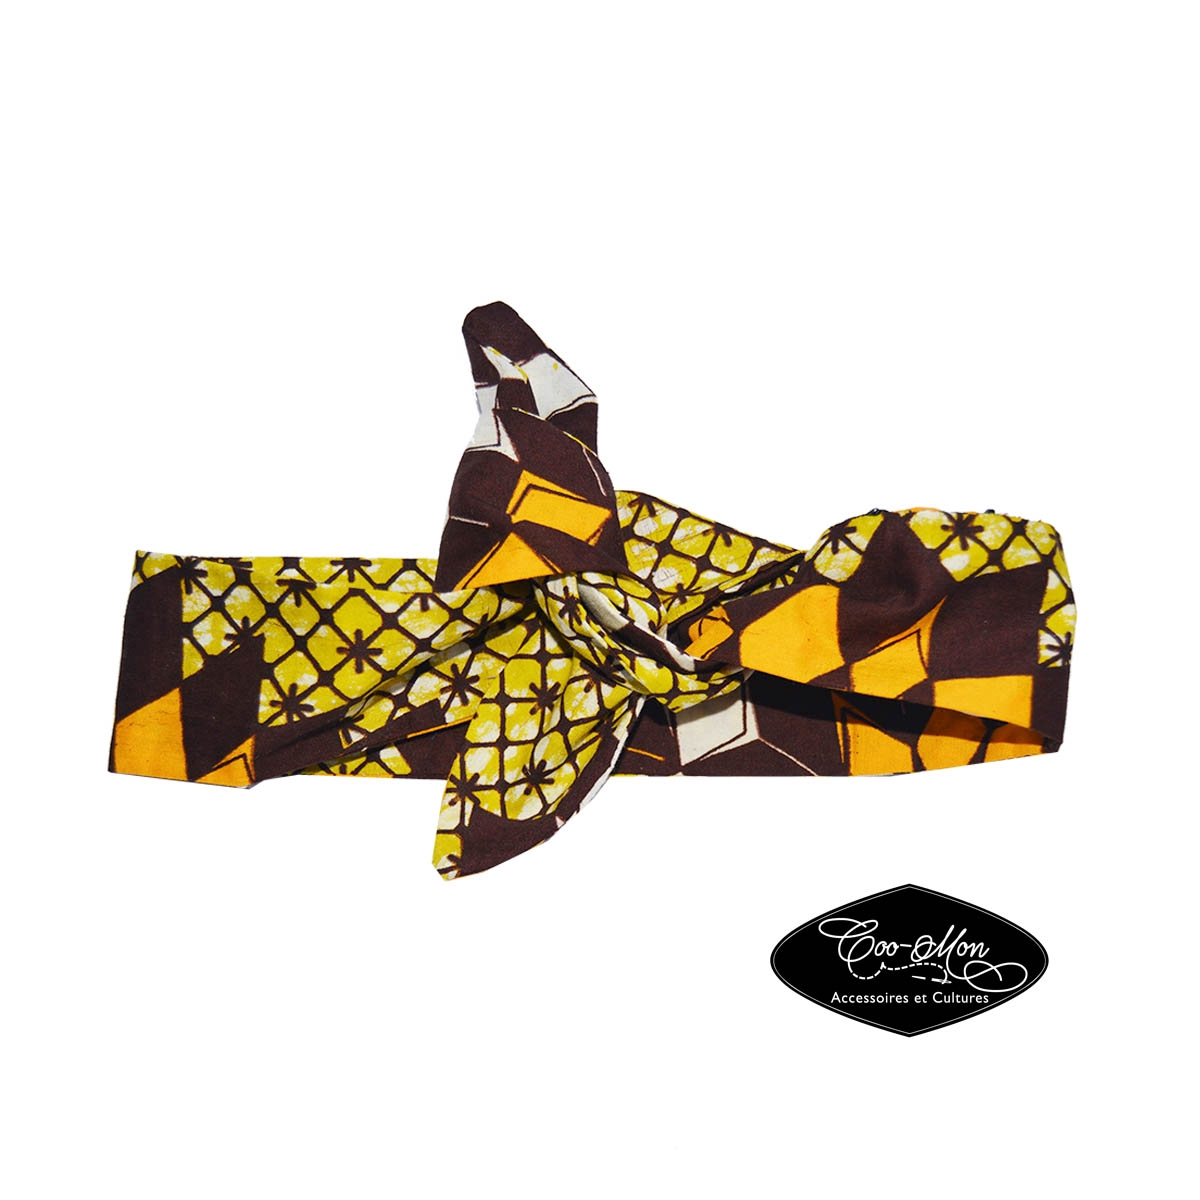 bandeau foulard turban serre t te chouchou femme fille b b pagne africain wax coo mon. Black Bedroom Furniture Sets. Home Design Ideas